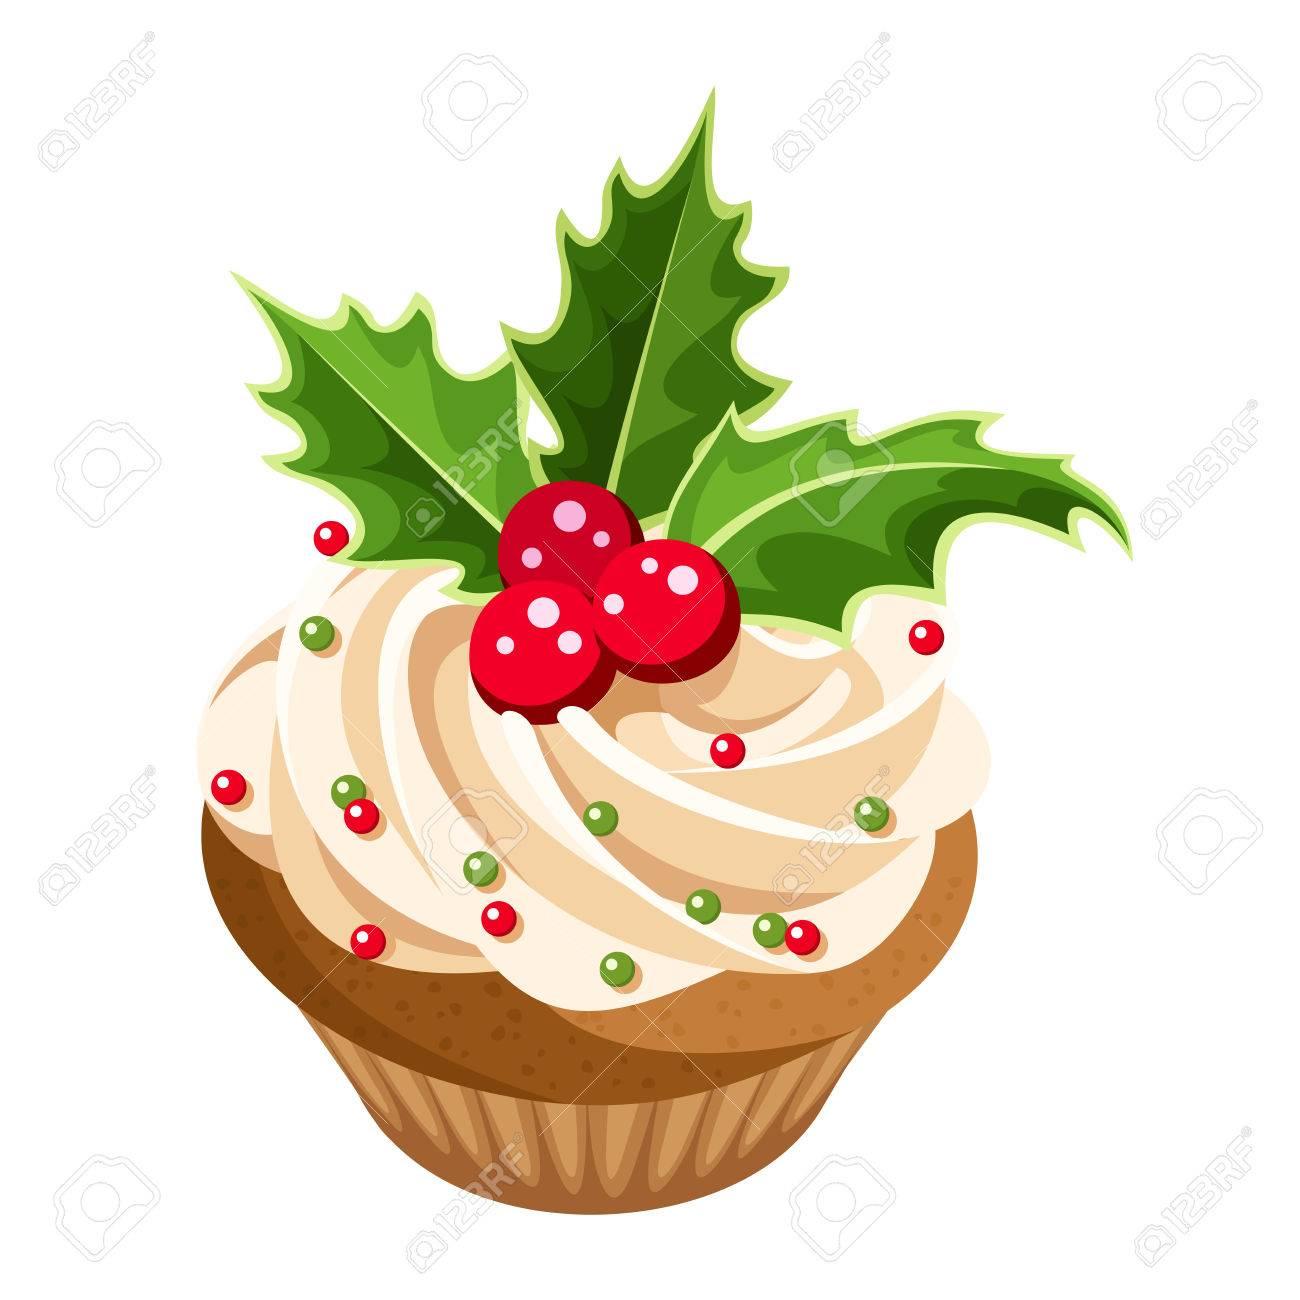 Christmas Cupcake Vector Illustration Royalty Free Cliparts ...